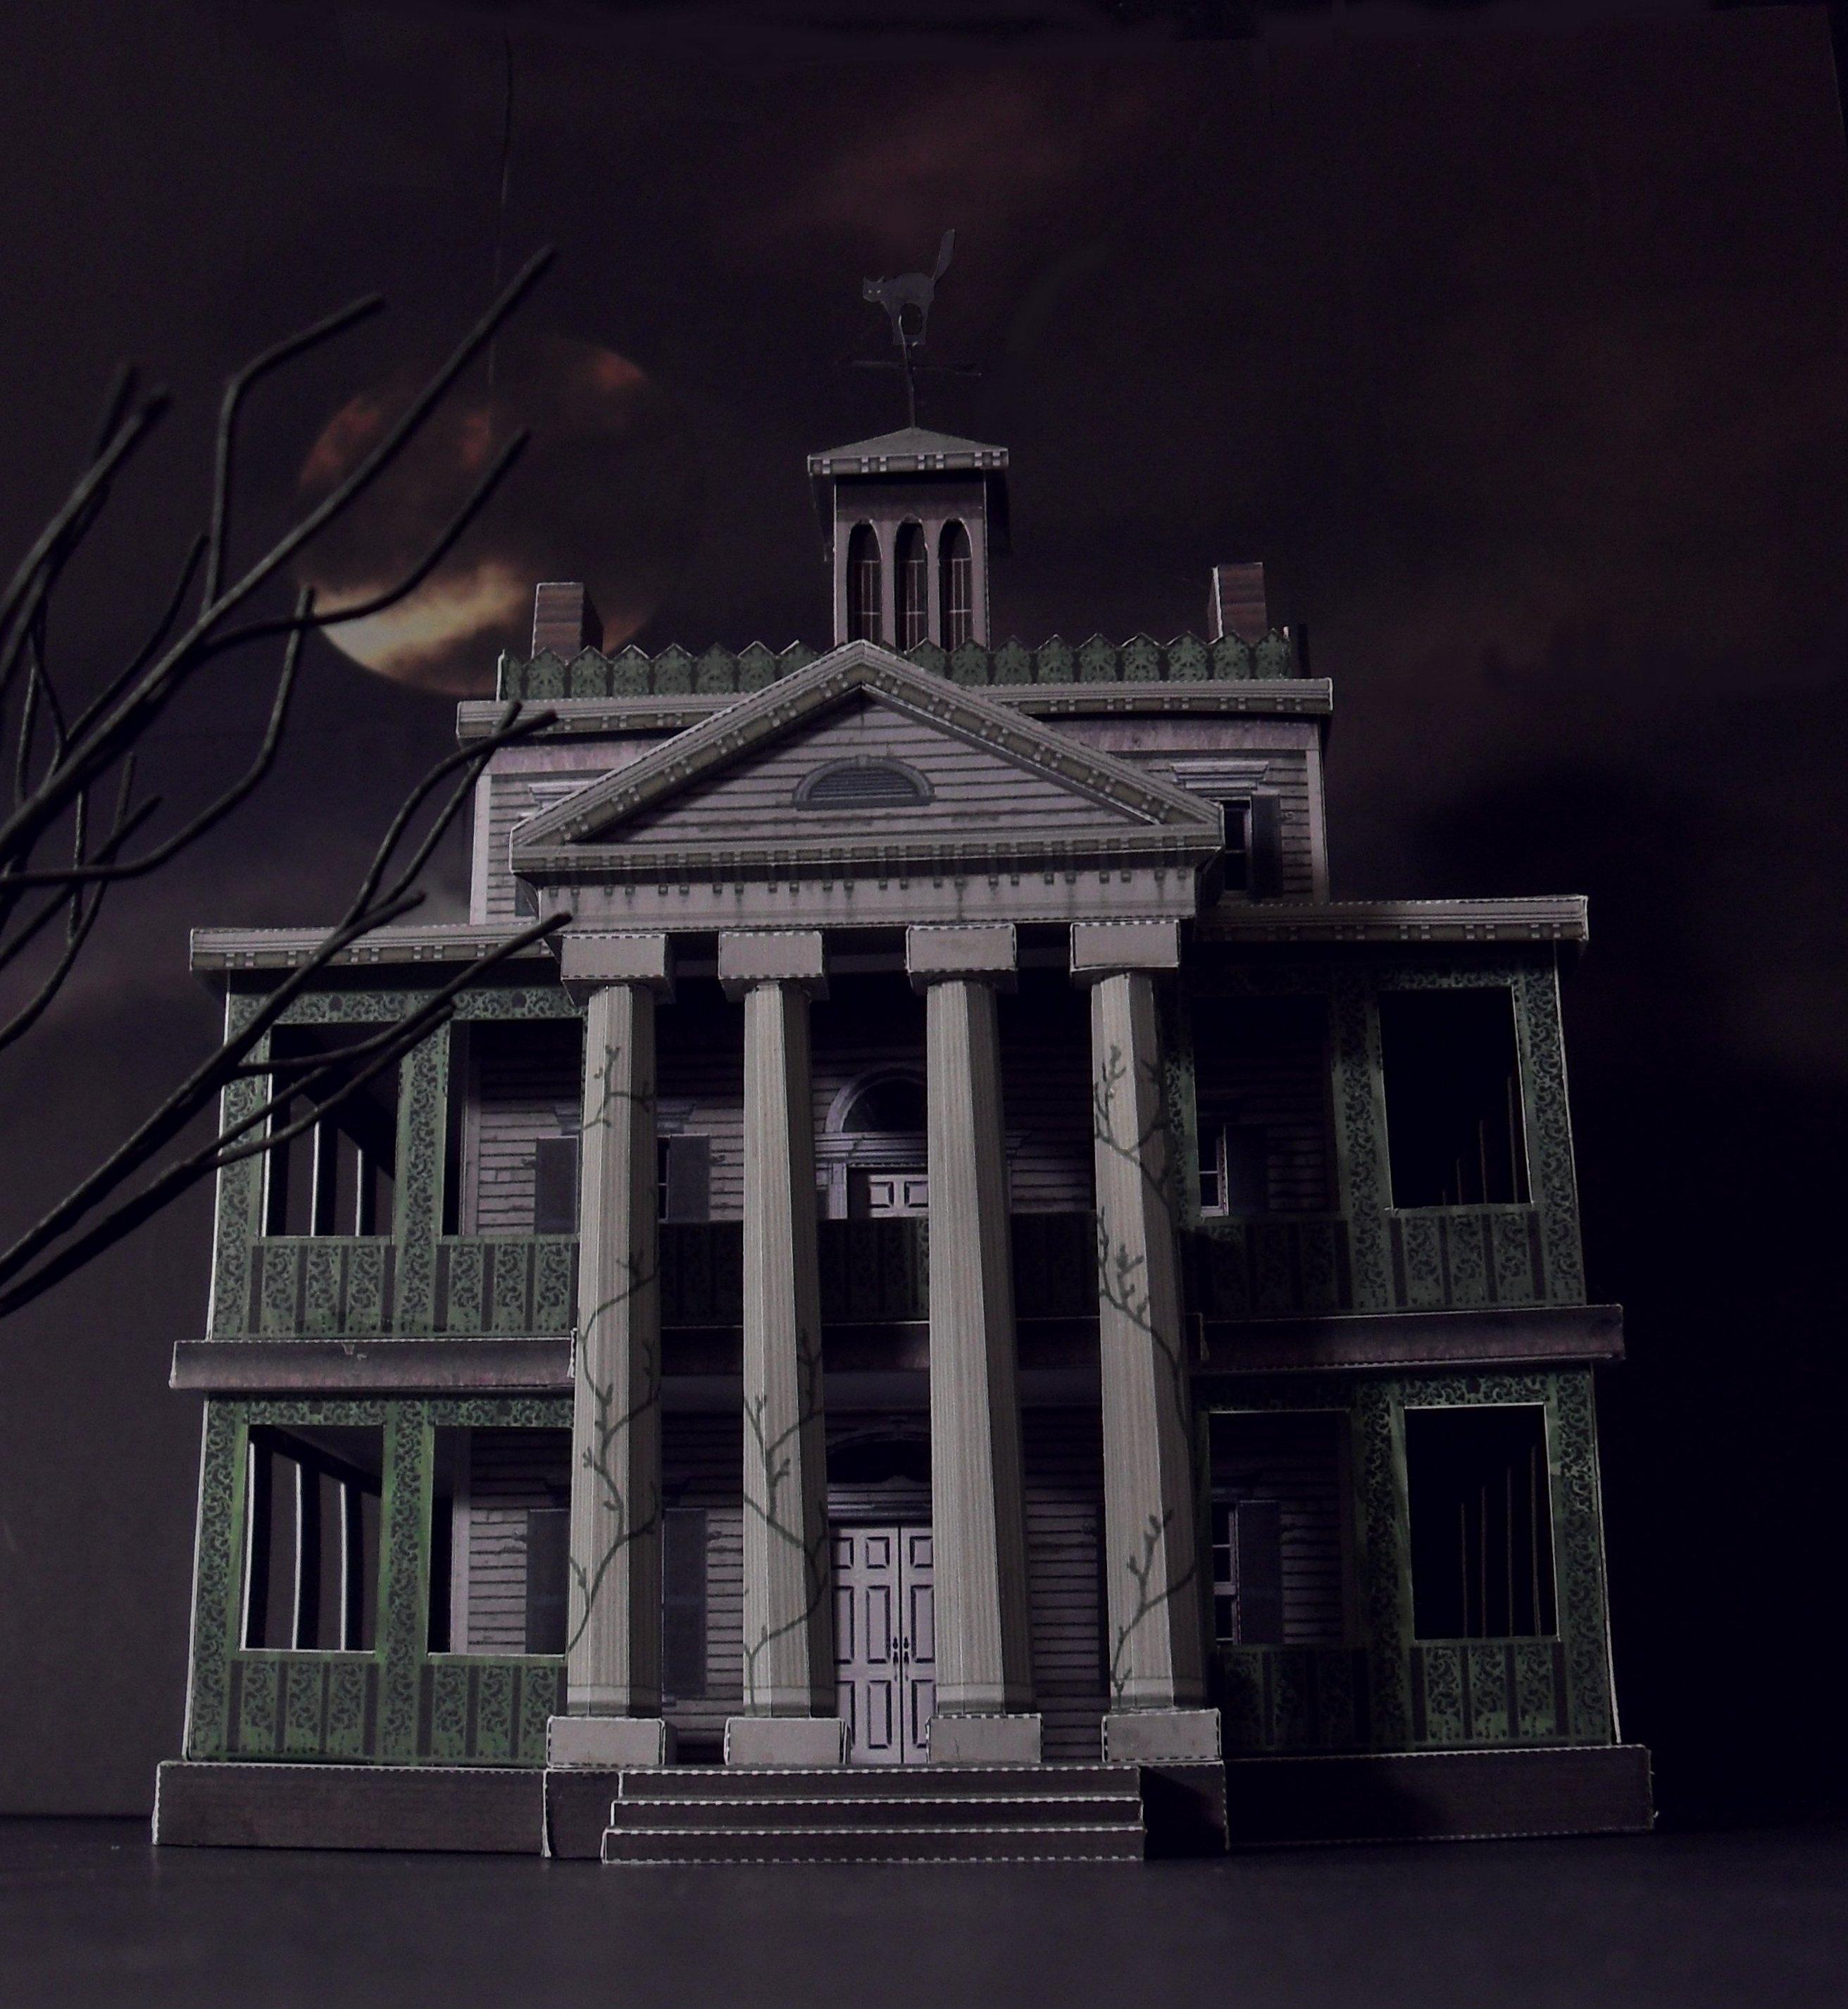 Disneys Original Ghost House By Gorto100 On DeviantArt